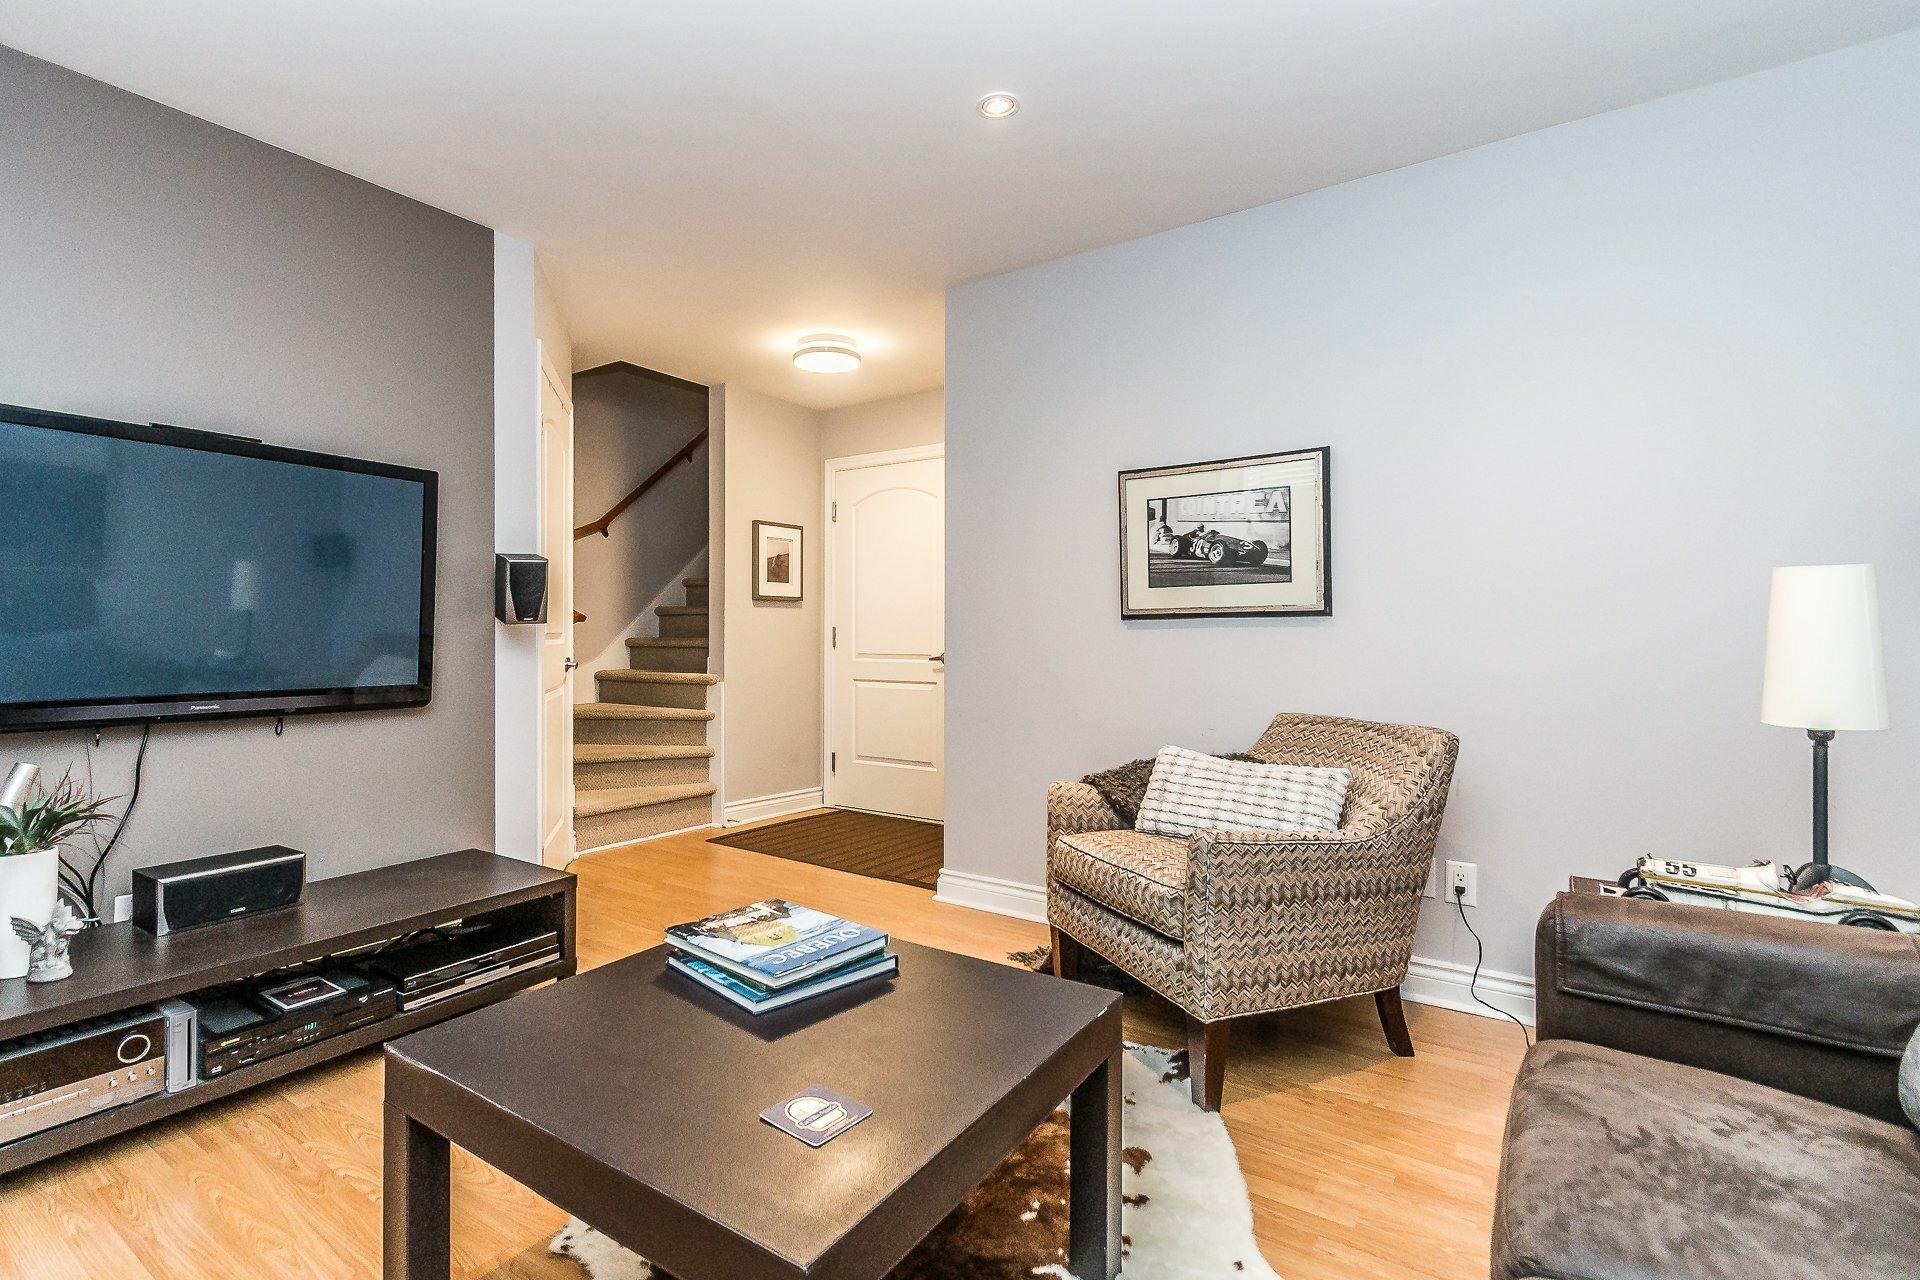 image 39 - MX - Casa sola - MX En venta Montréal Lachine  - 8 habitaciones